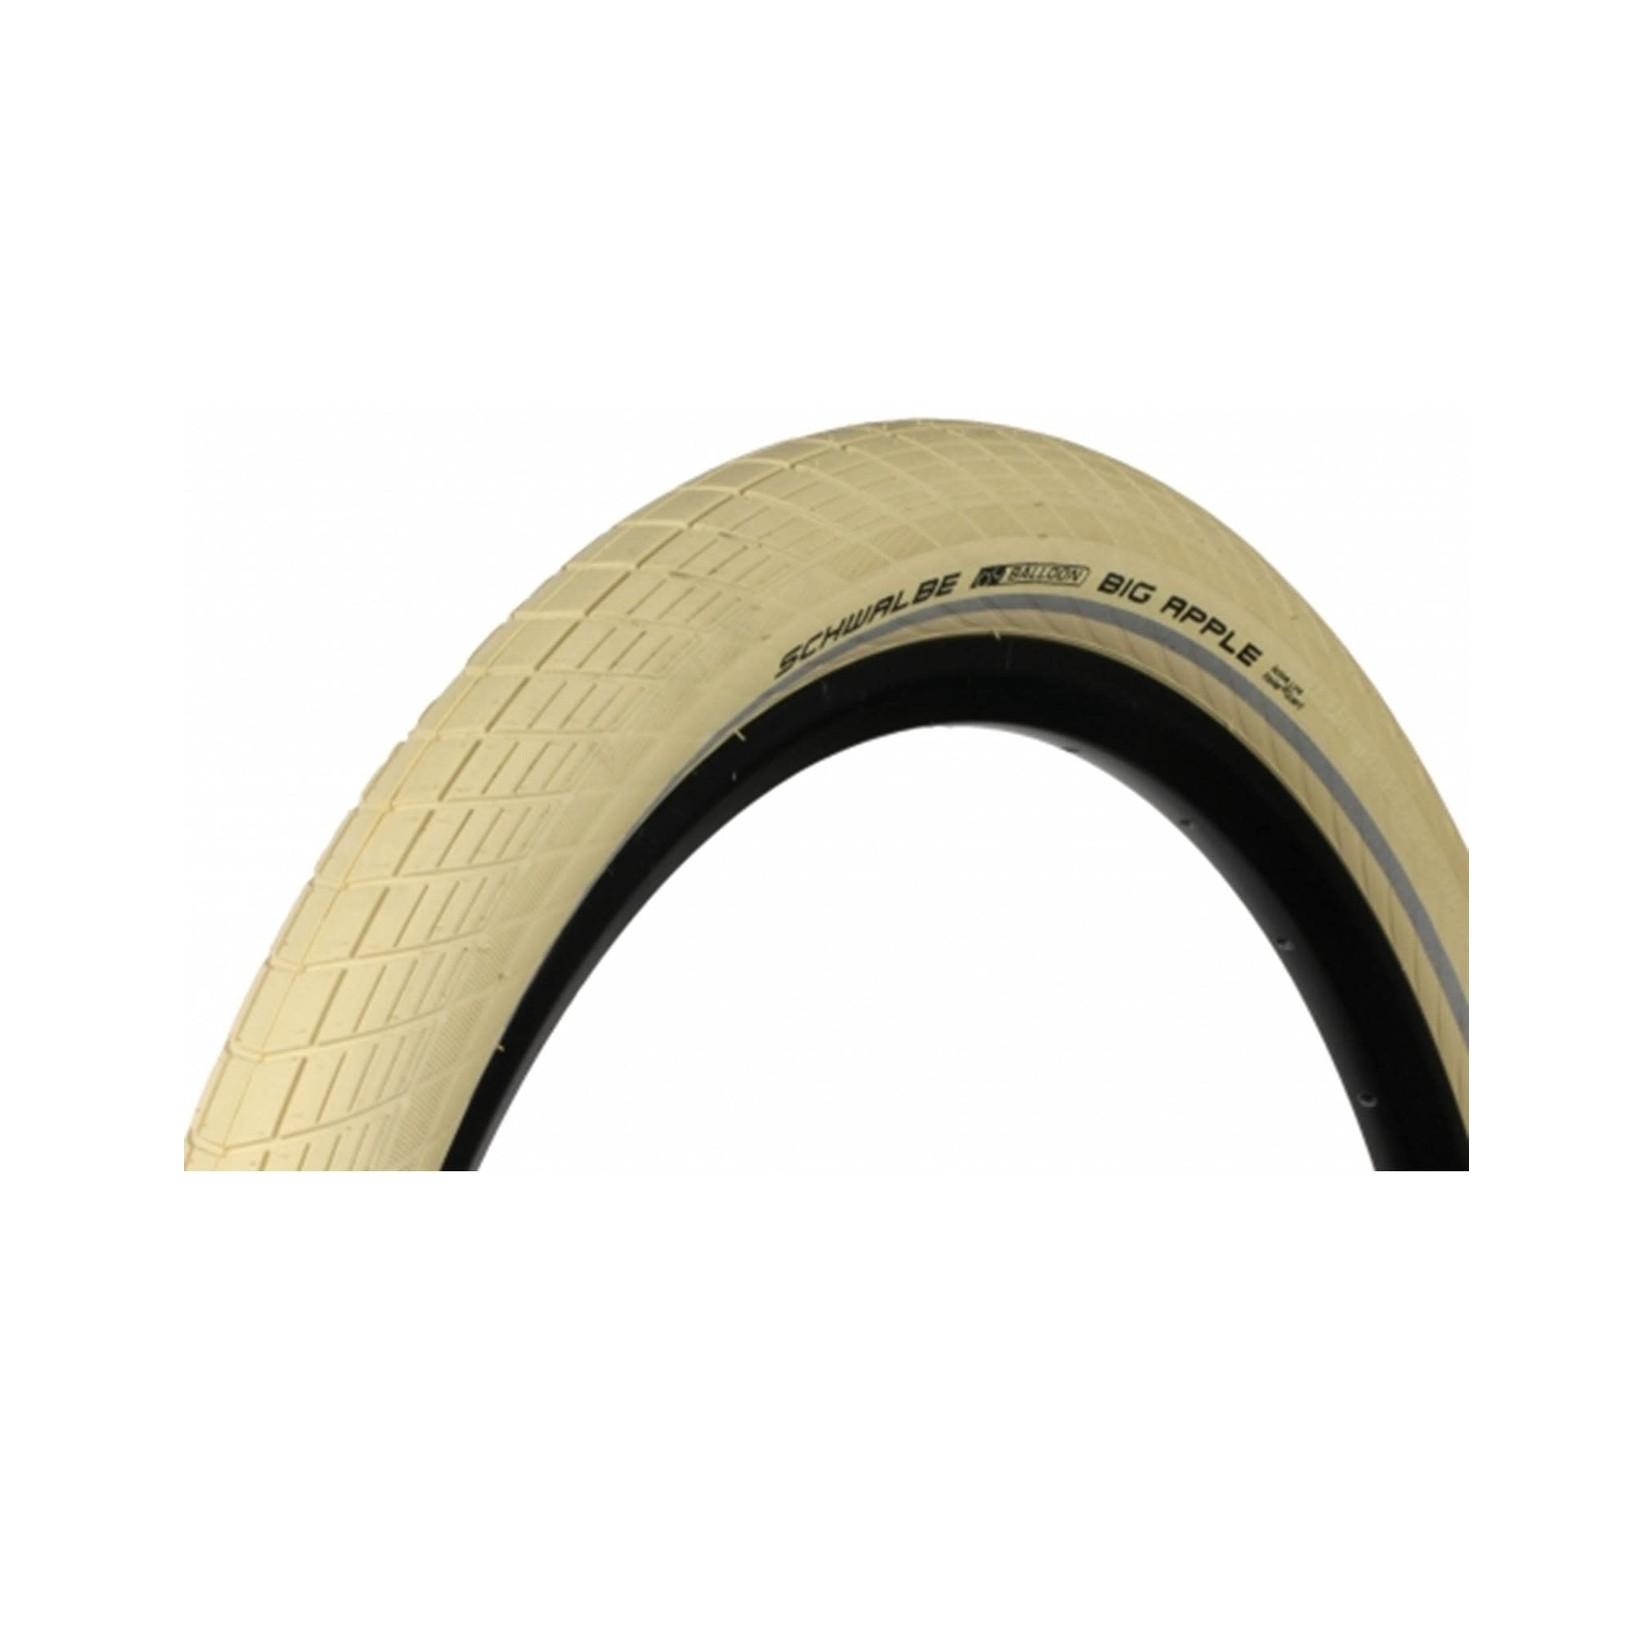 Schwalbe Big Apple 29 x 2 Tyre